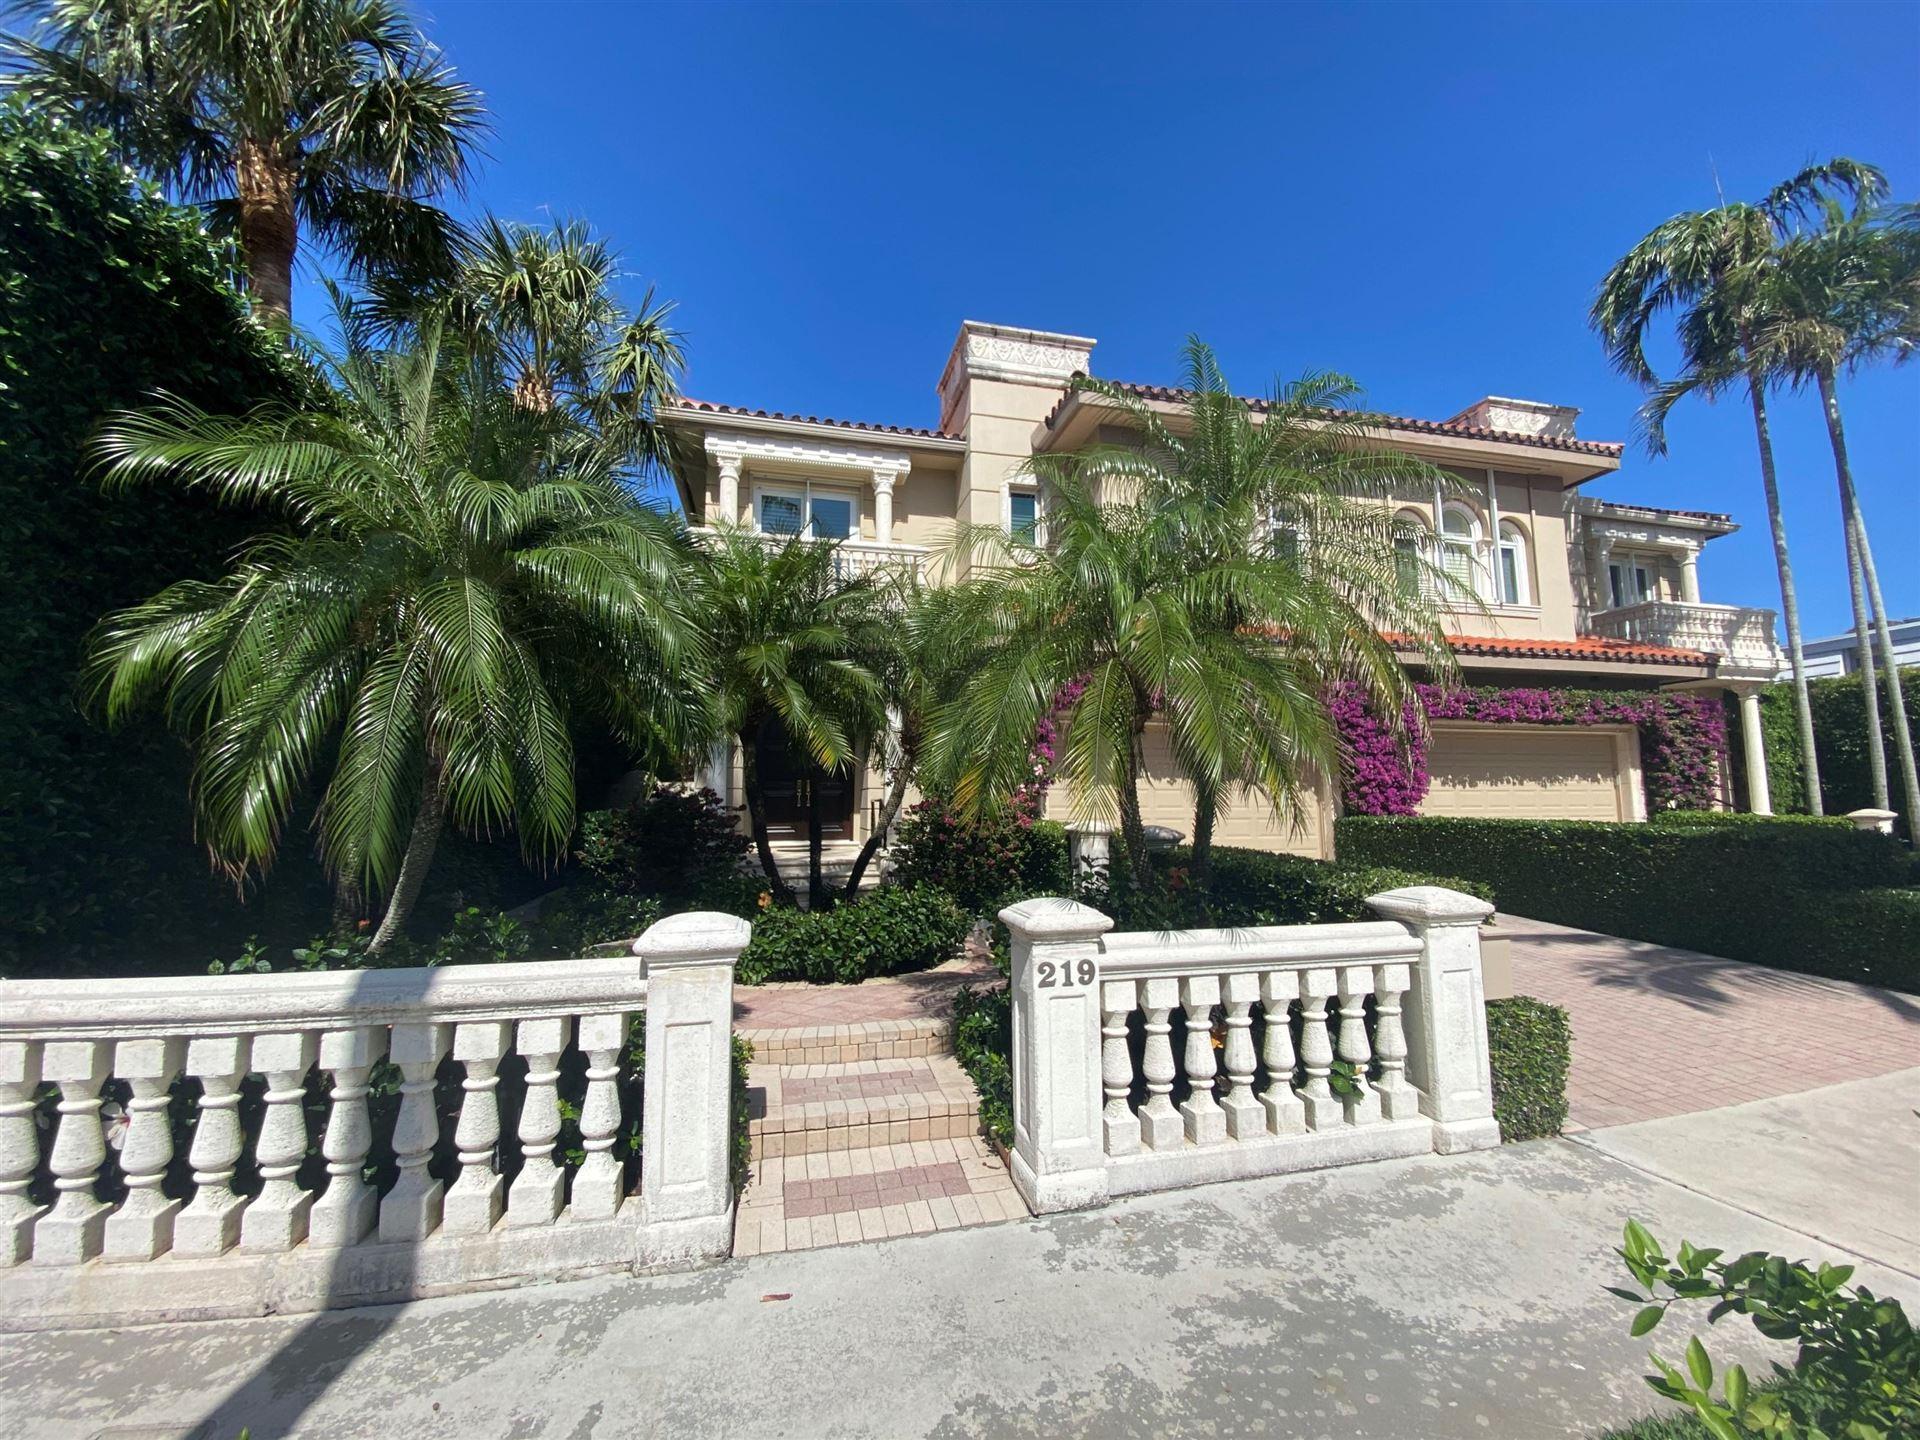 219 Everglade Avenue, Palm Beach, FL 33480 - #: RX-10692649